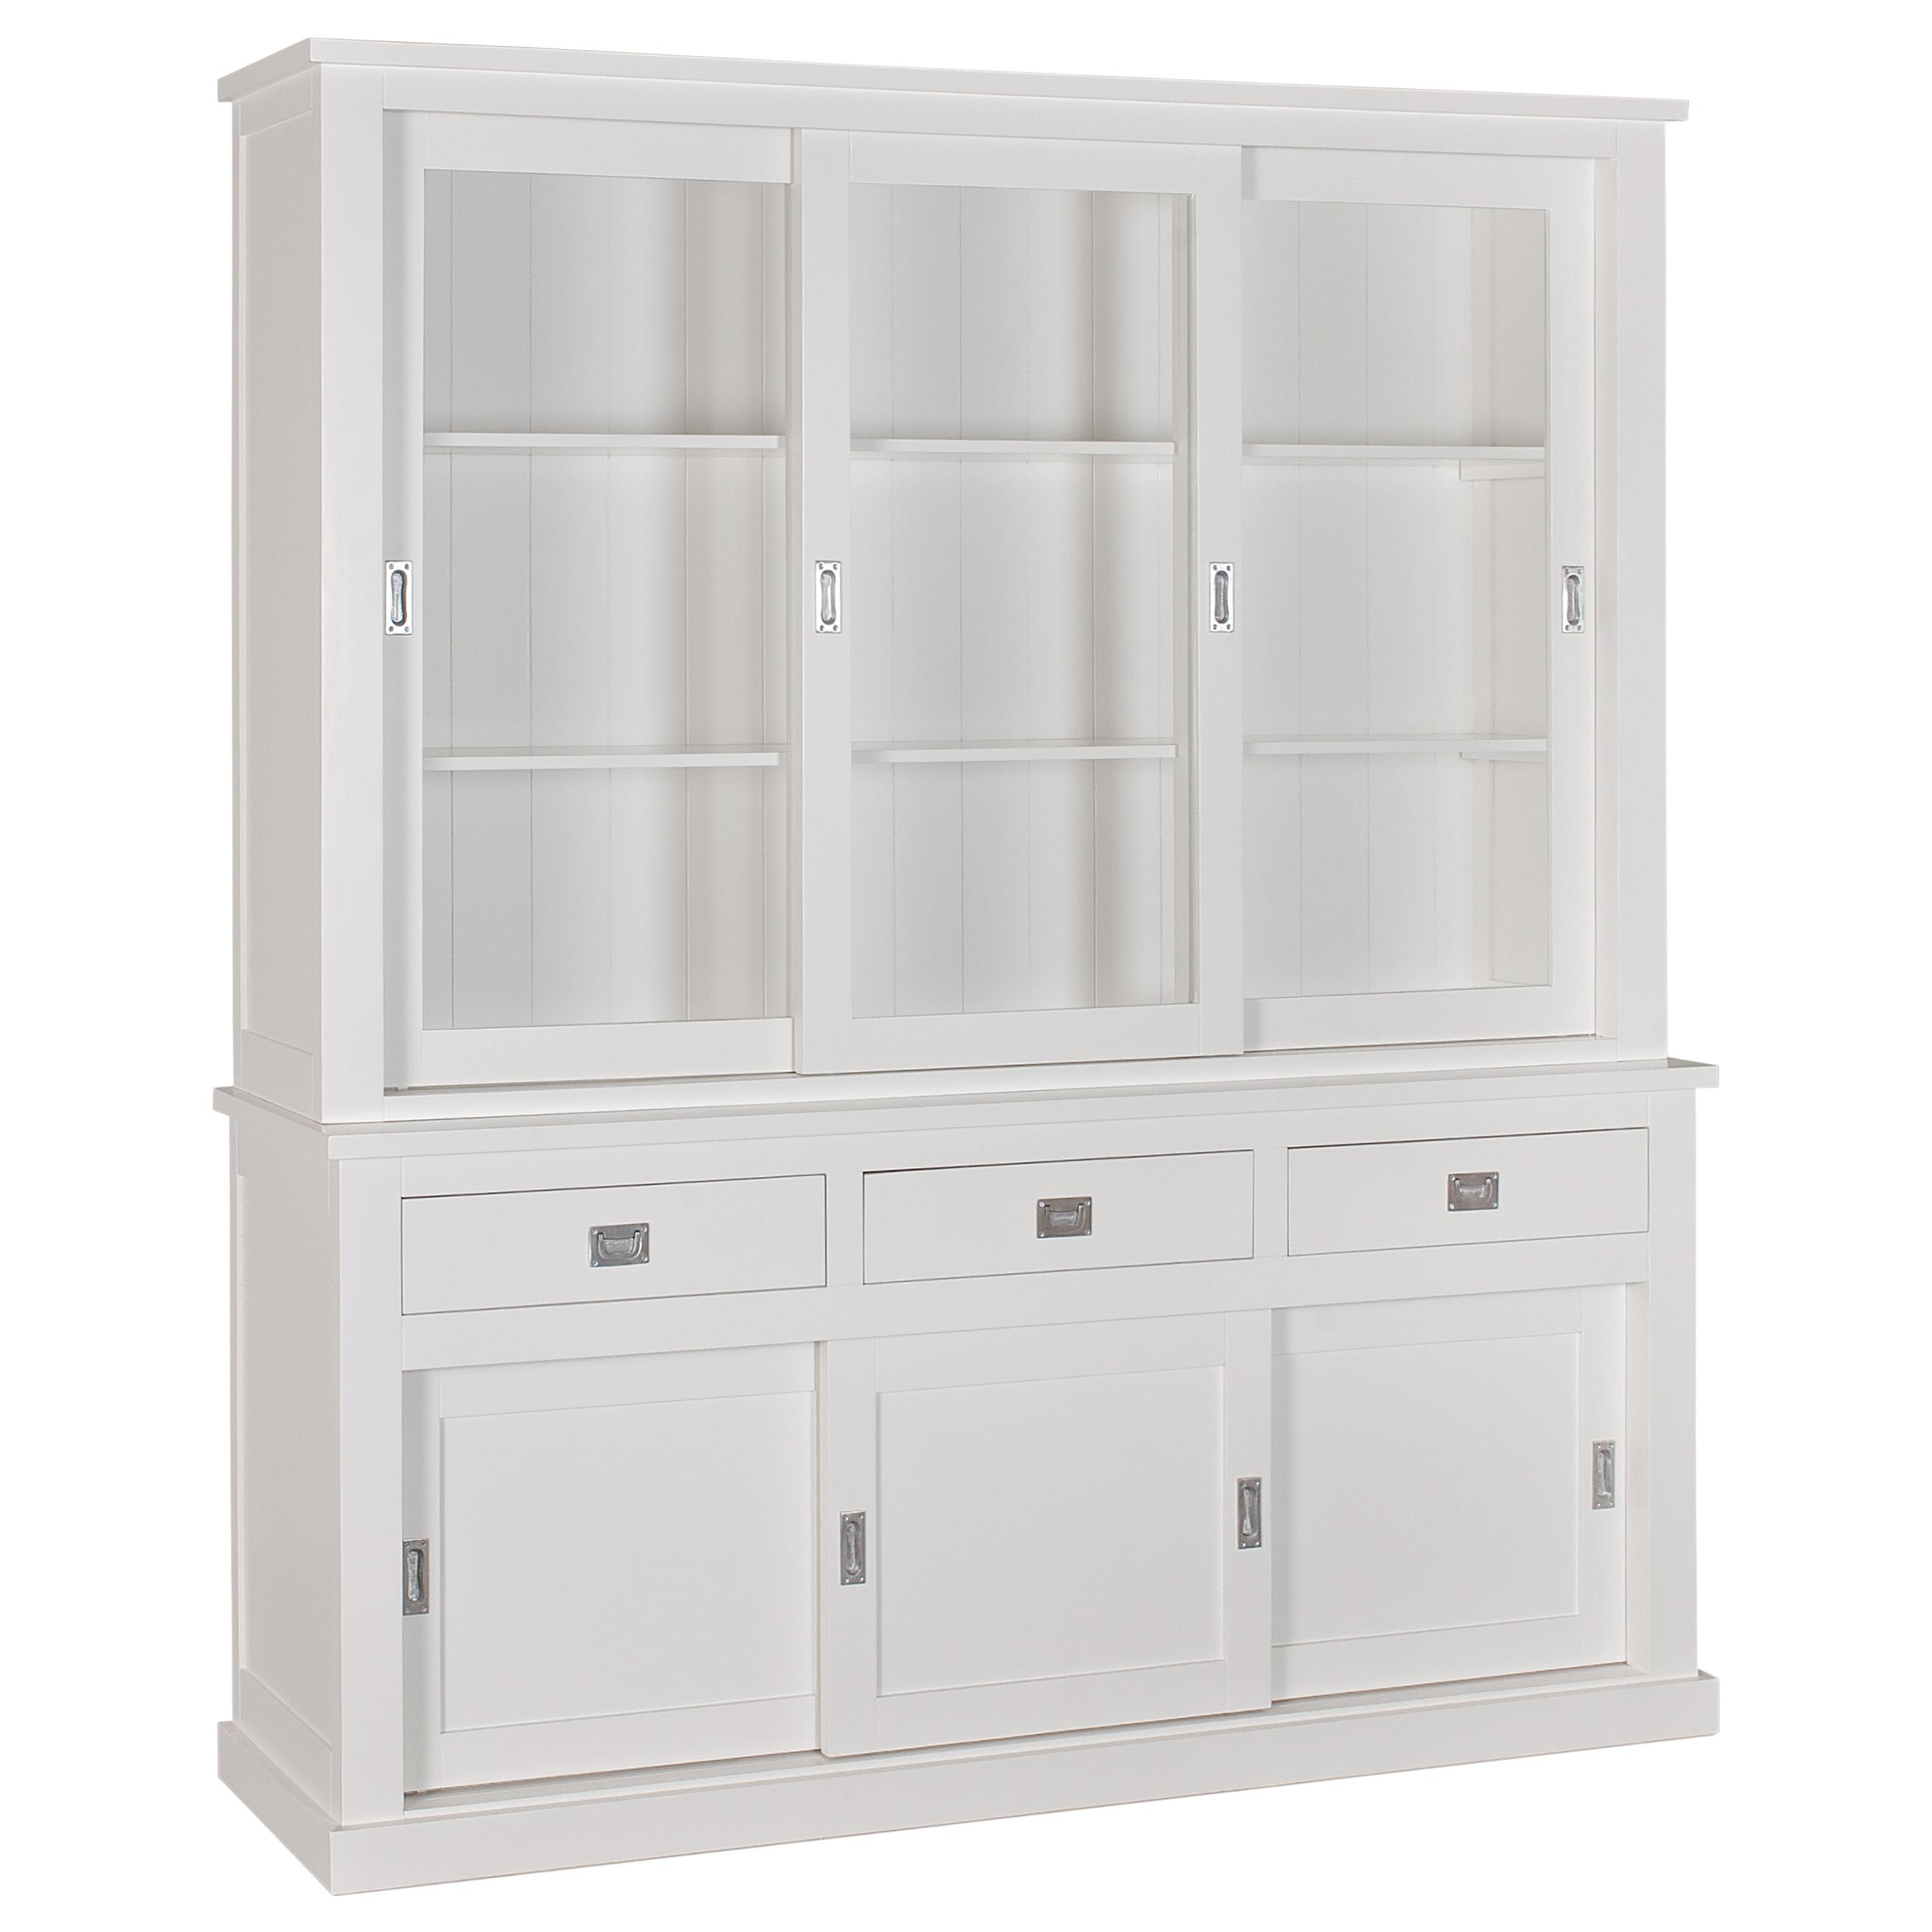 Buffet vitrine boxx 2x3 portes 3 tiroirs richmond interior for Buffet et vitrine